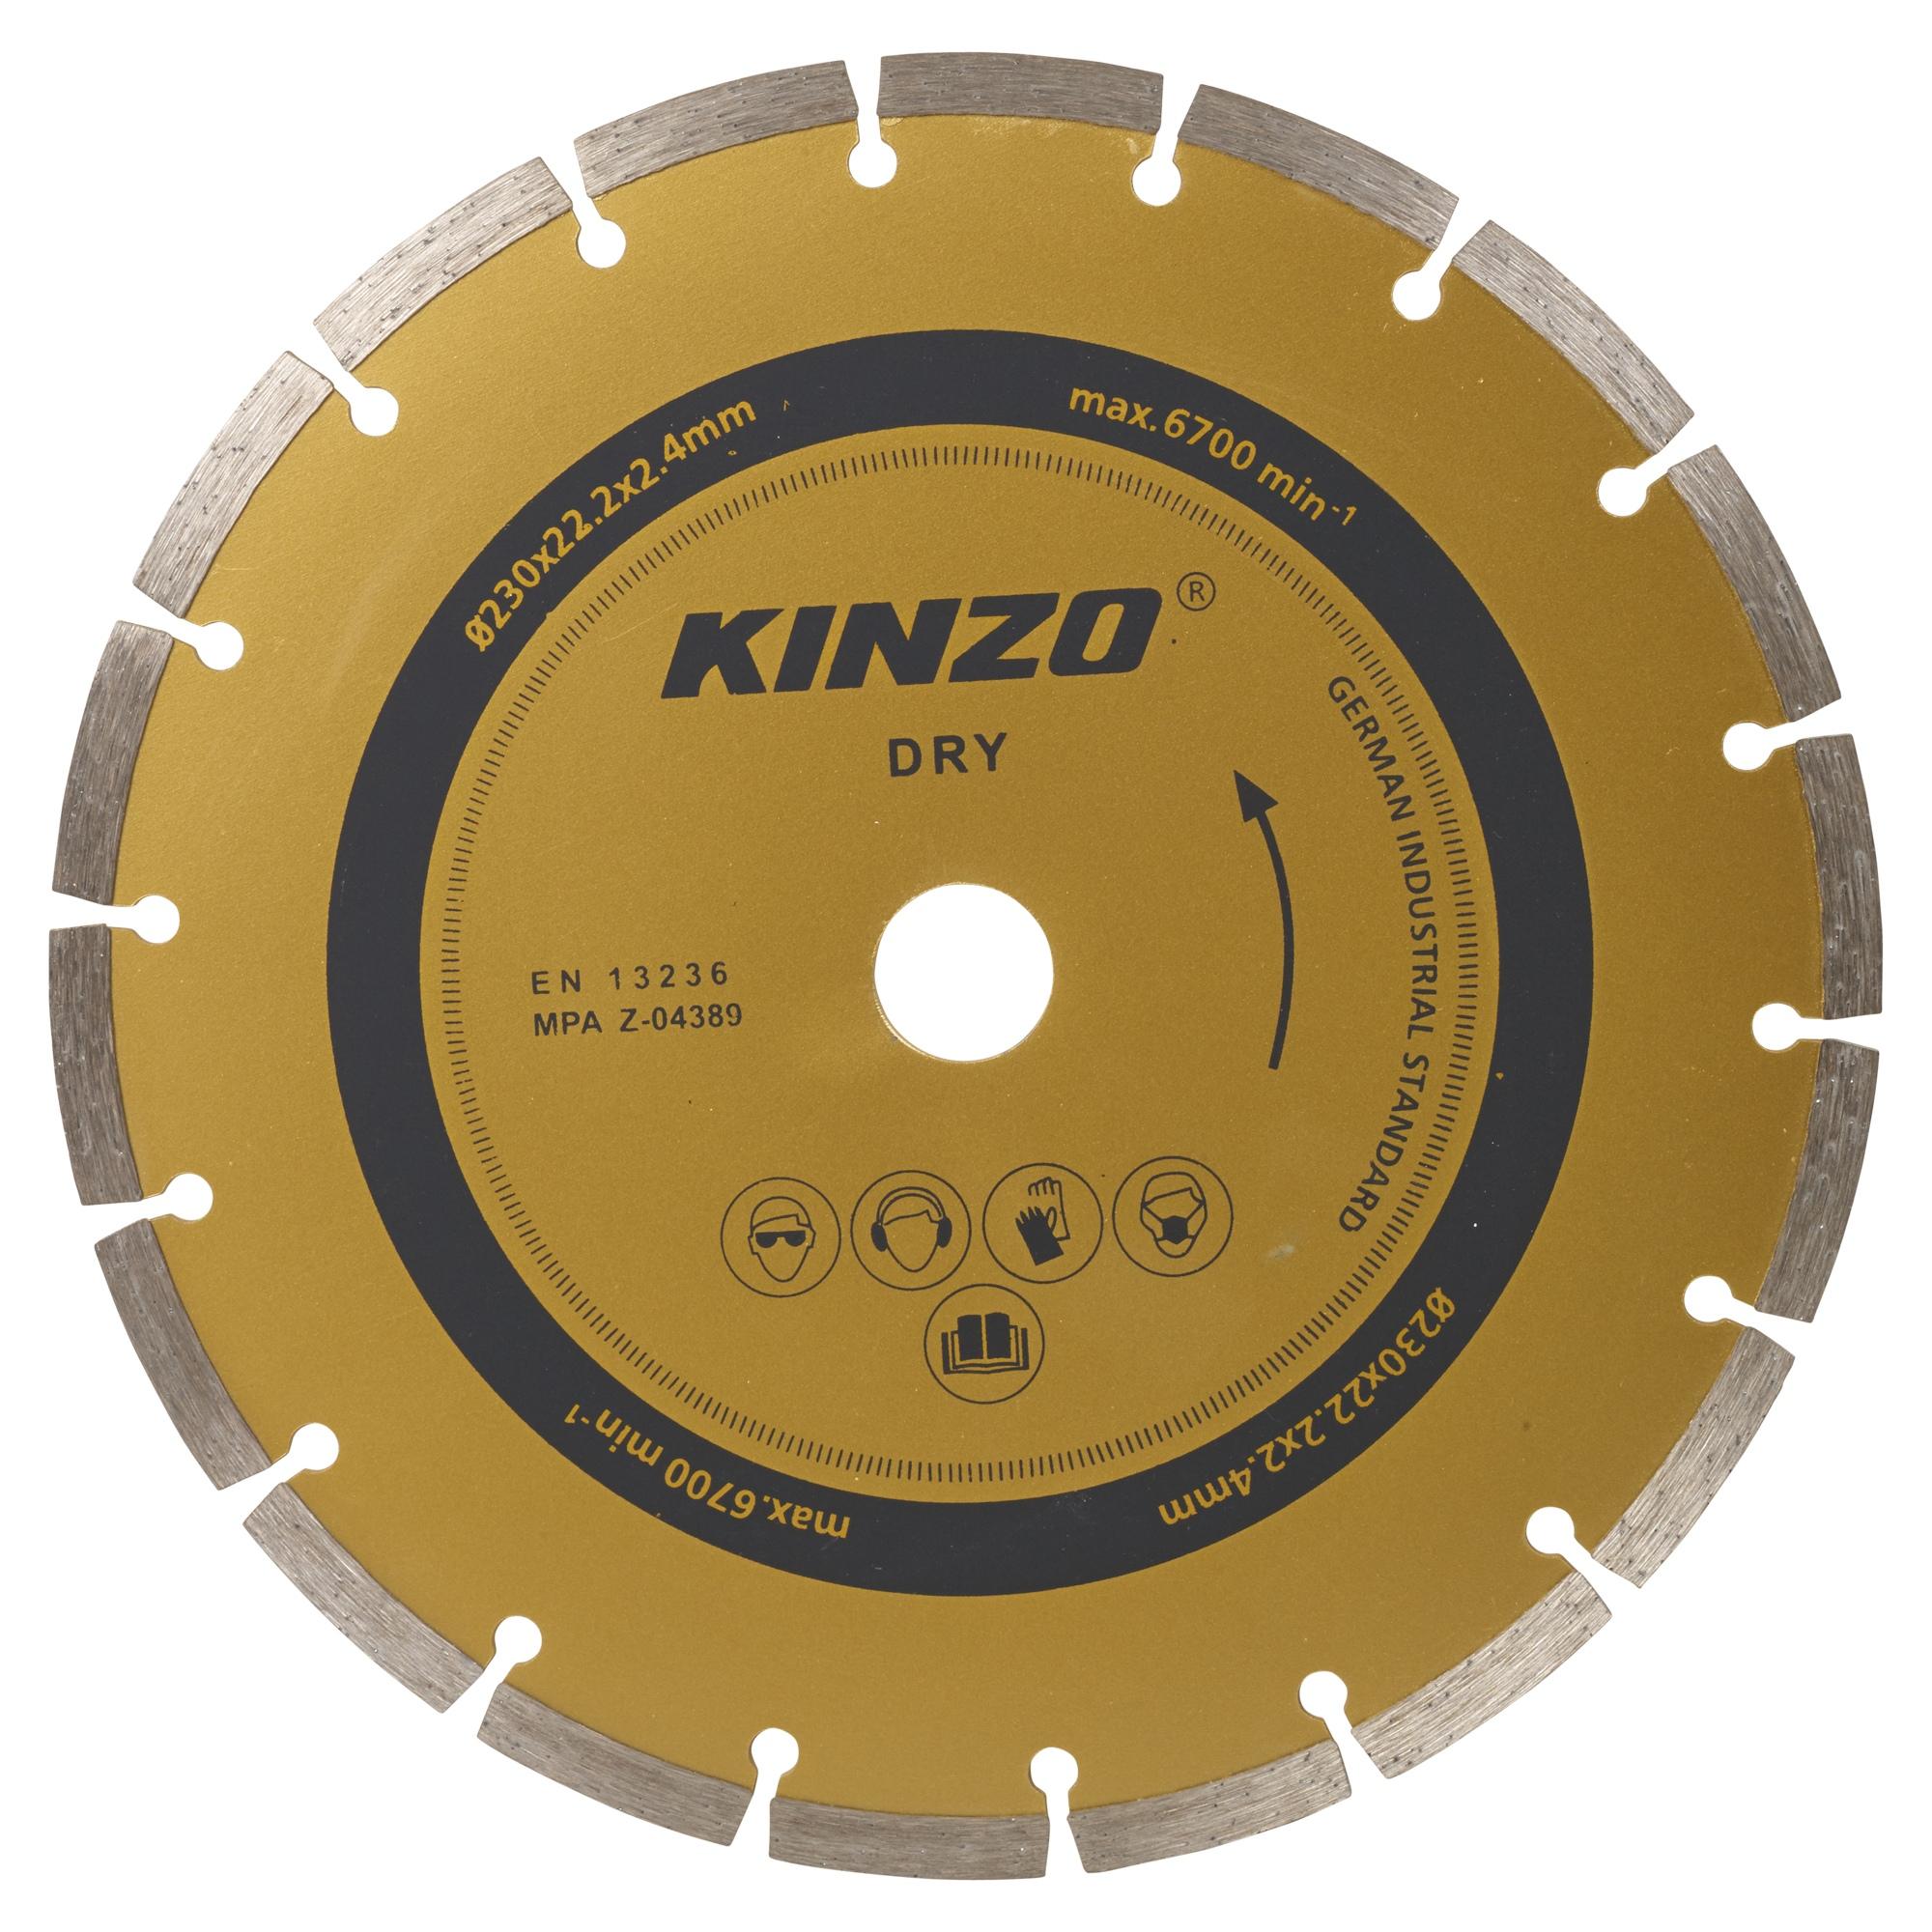 Diamond Cutting Disc Sizes